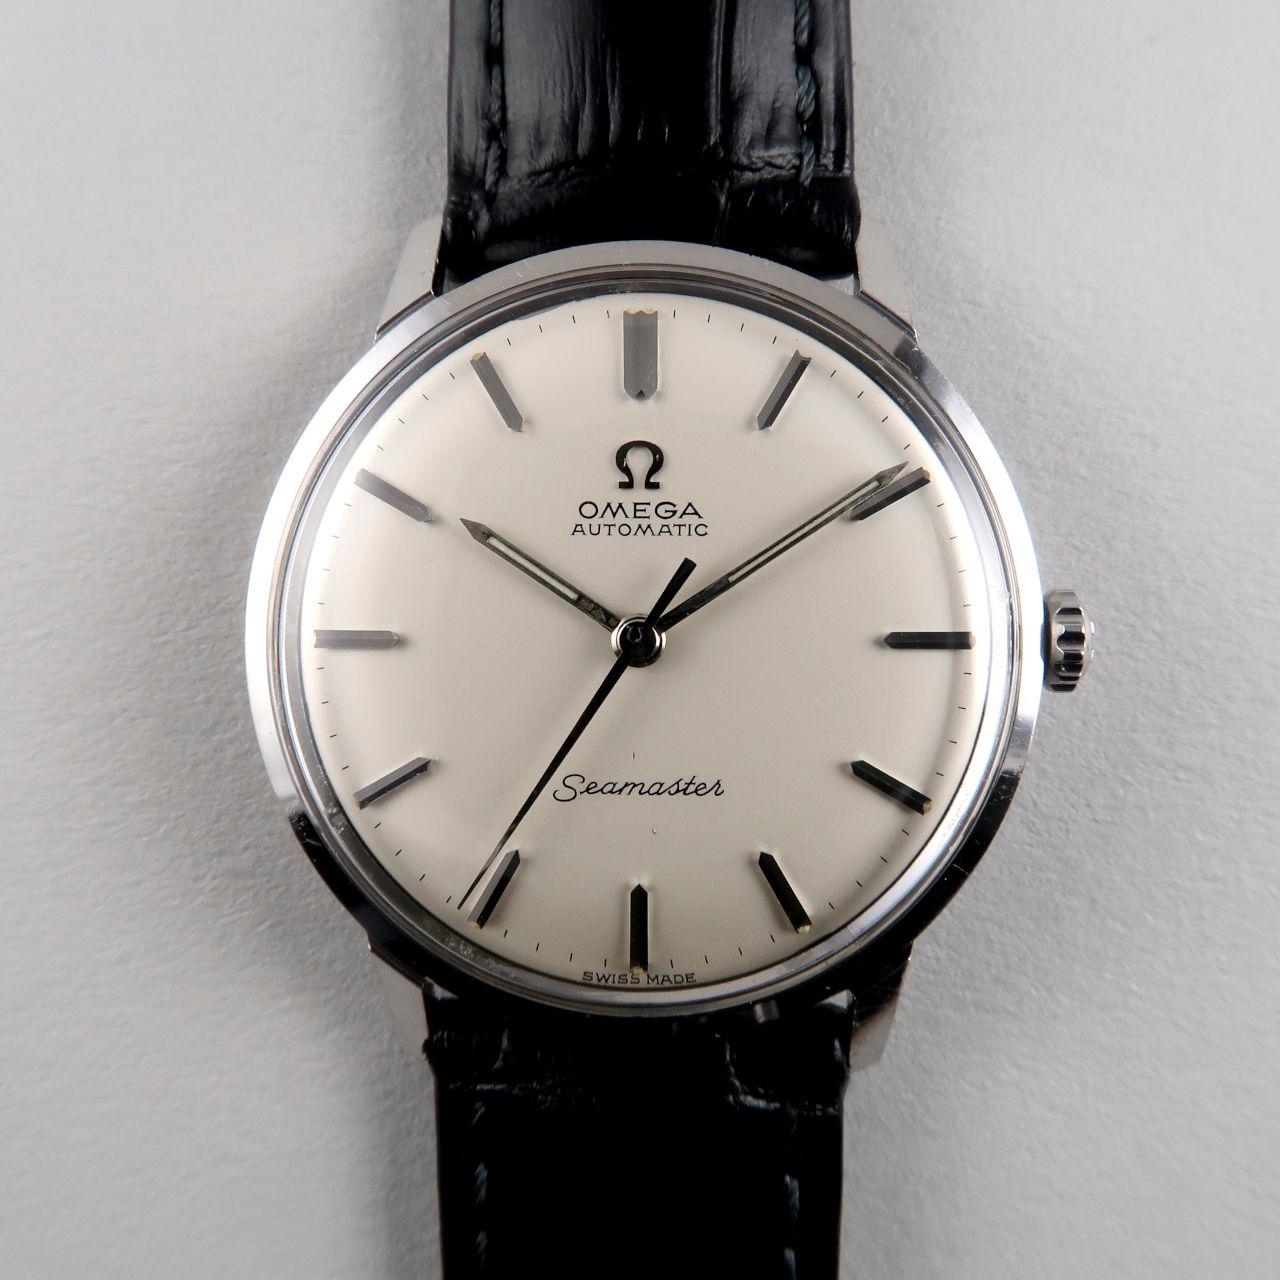 Omega Seamaster Ref. 165.001 circa 1963